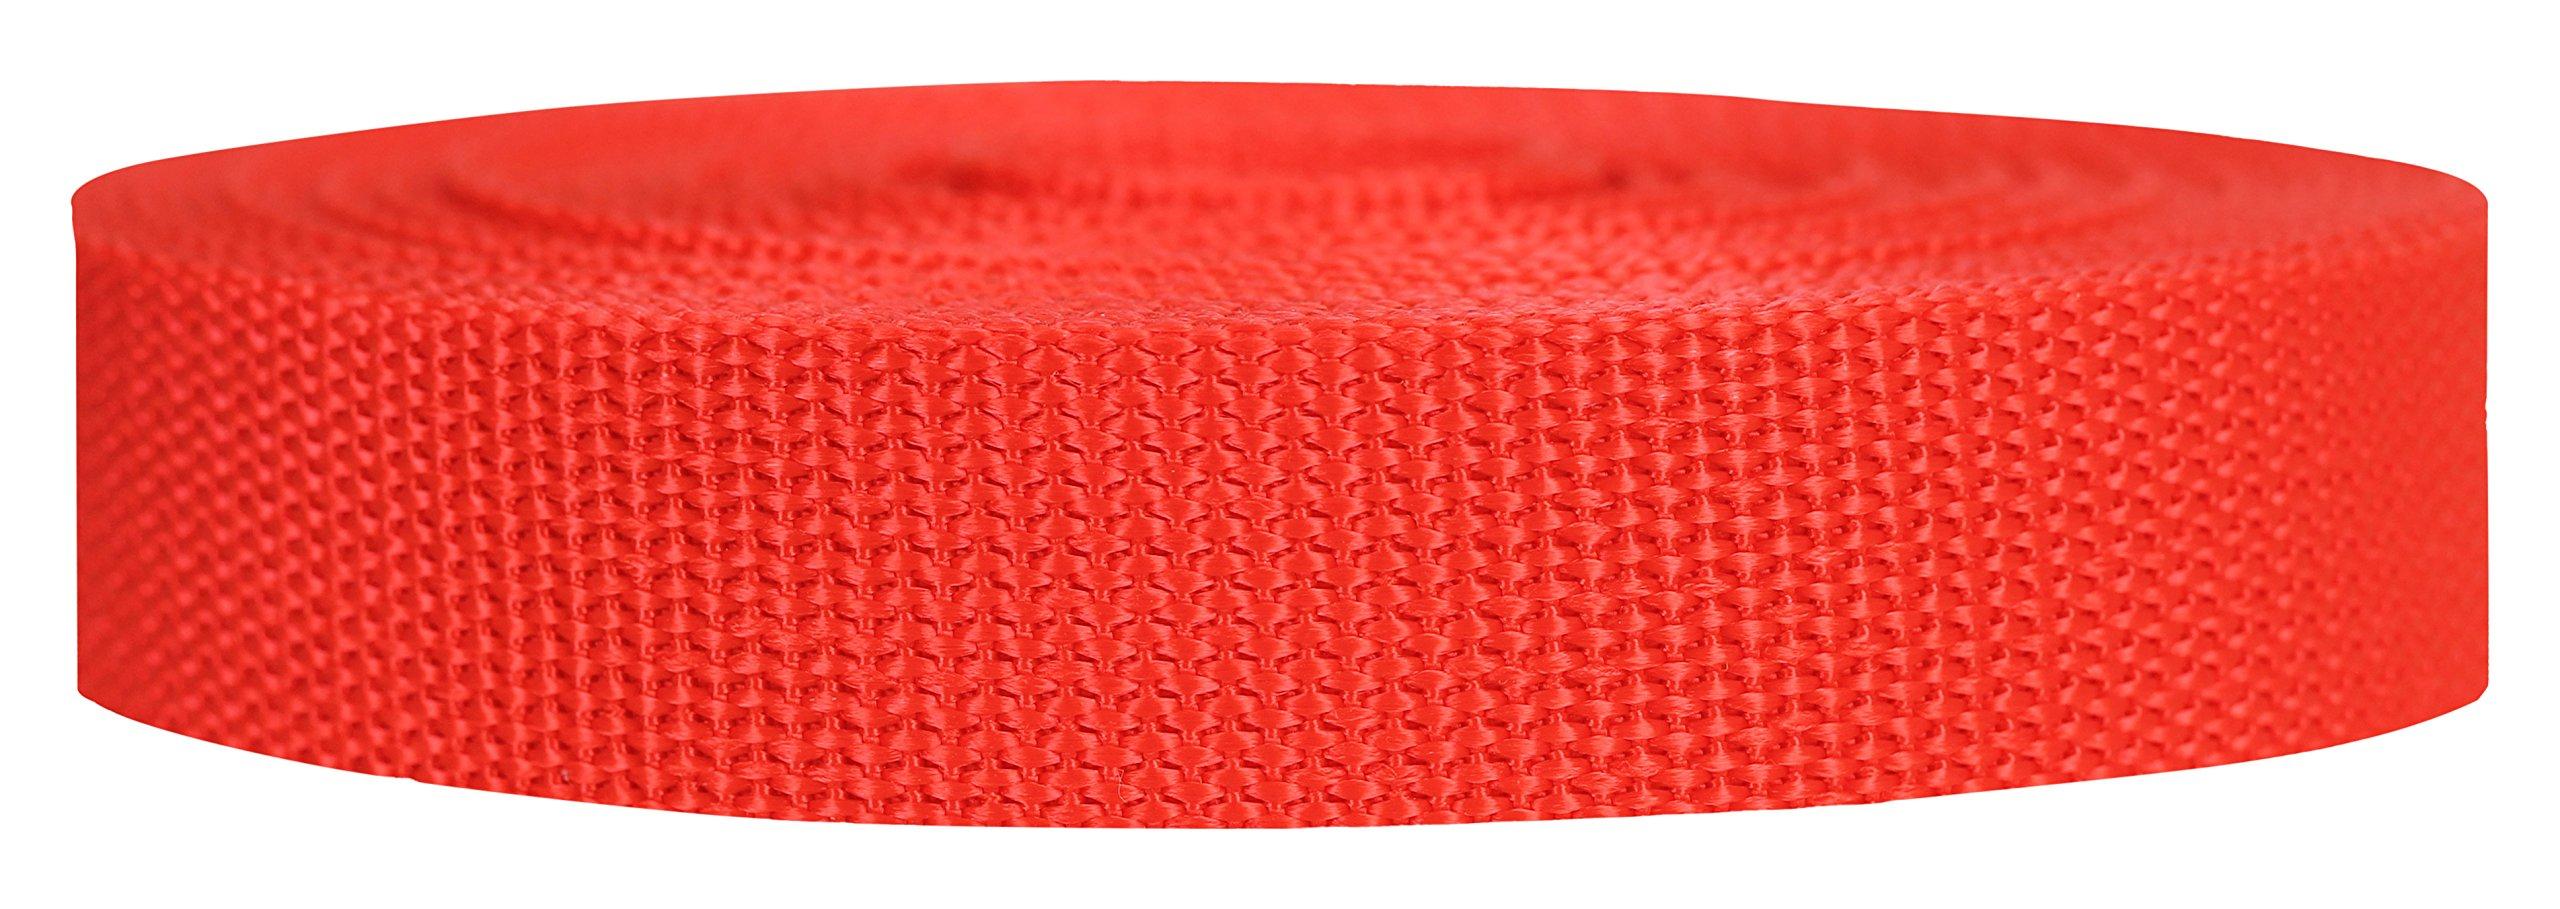 Strapworks Heavyweight Polypropylene Webbing - Heavy Duty Poly Strapping for Outdoor DIY Gear Repair, 1 Inch x 10 Yards - Blood Orange